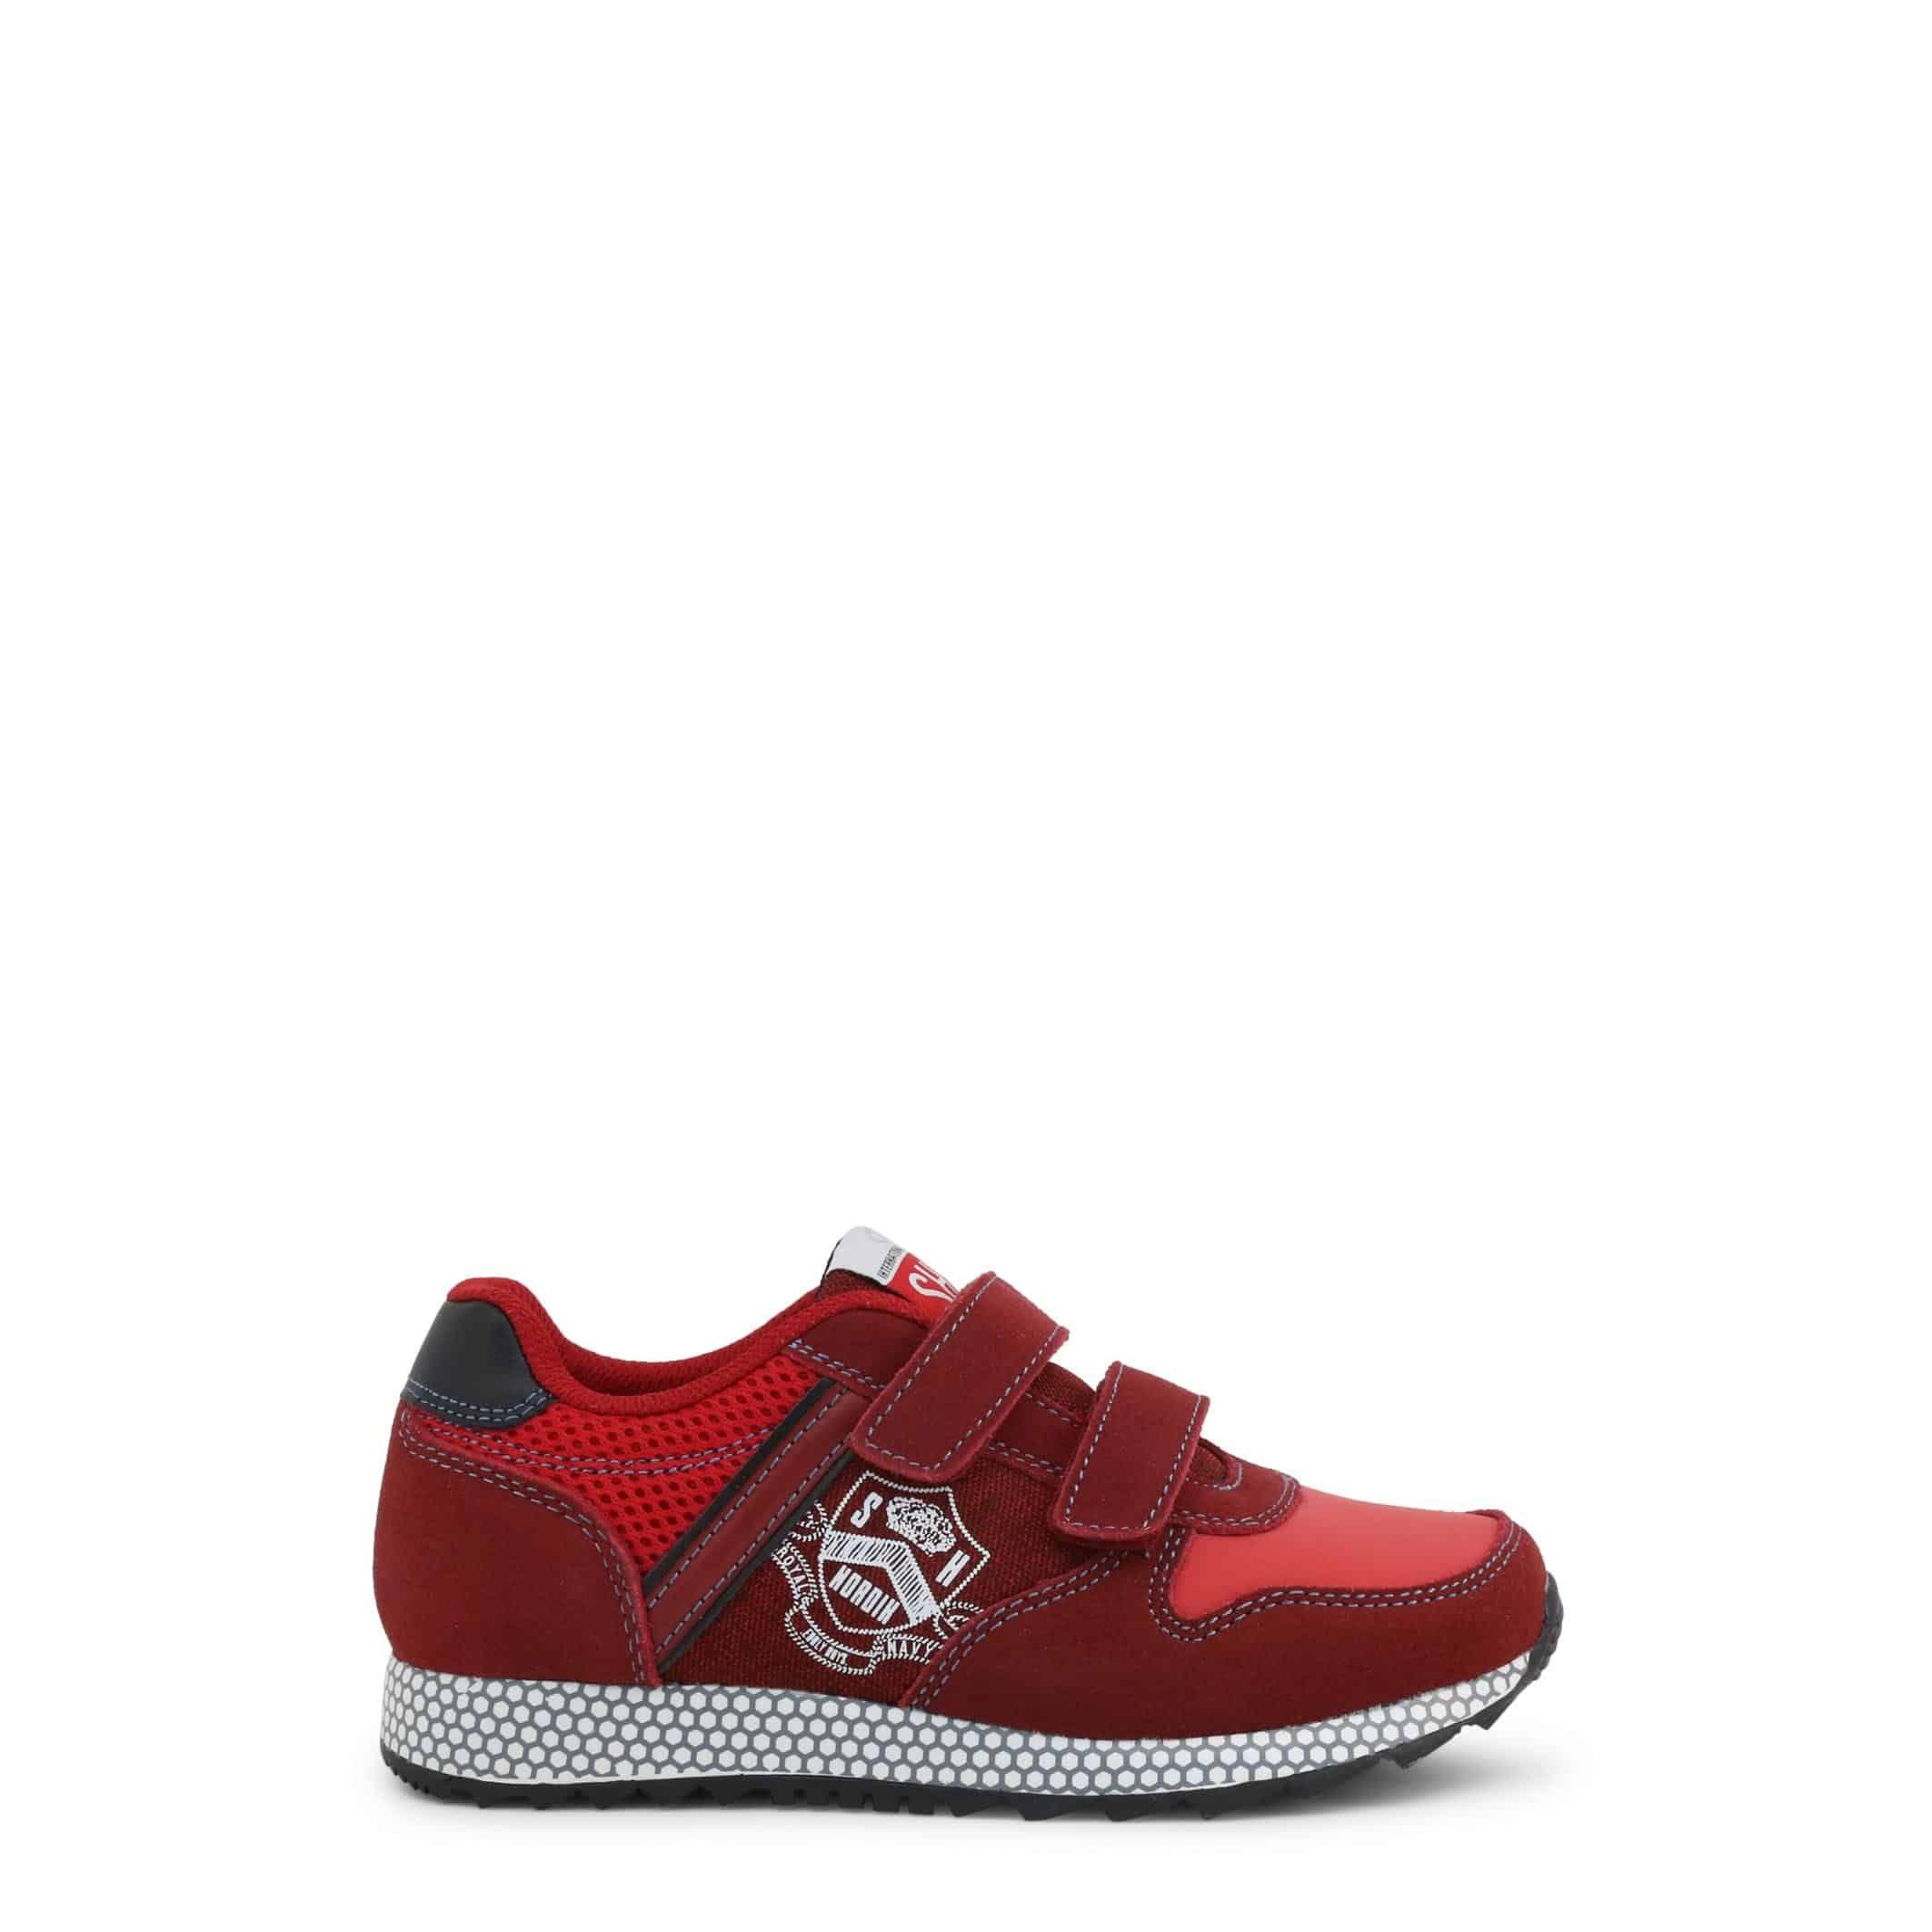 Chaussures Shone – 15012-130